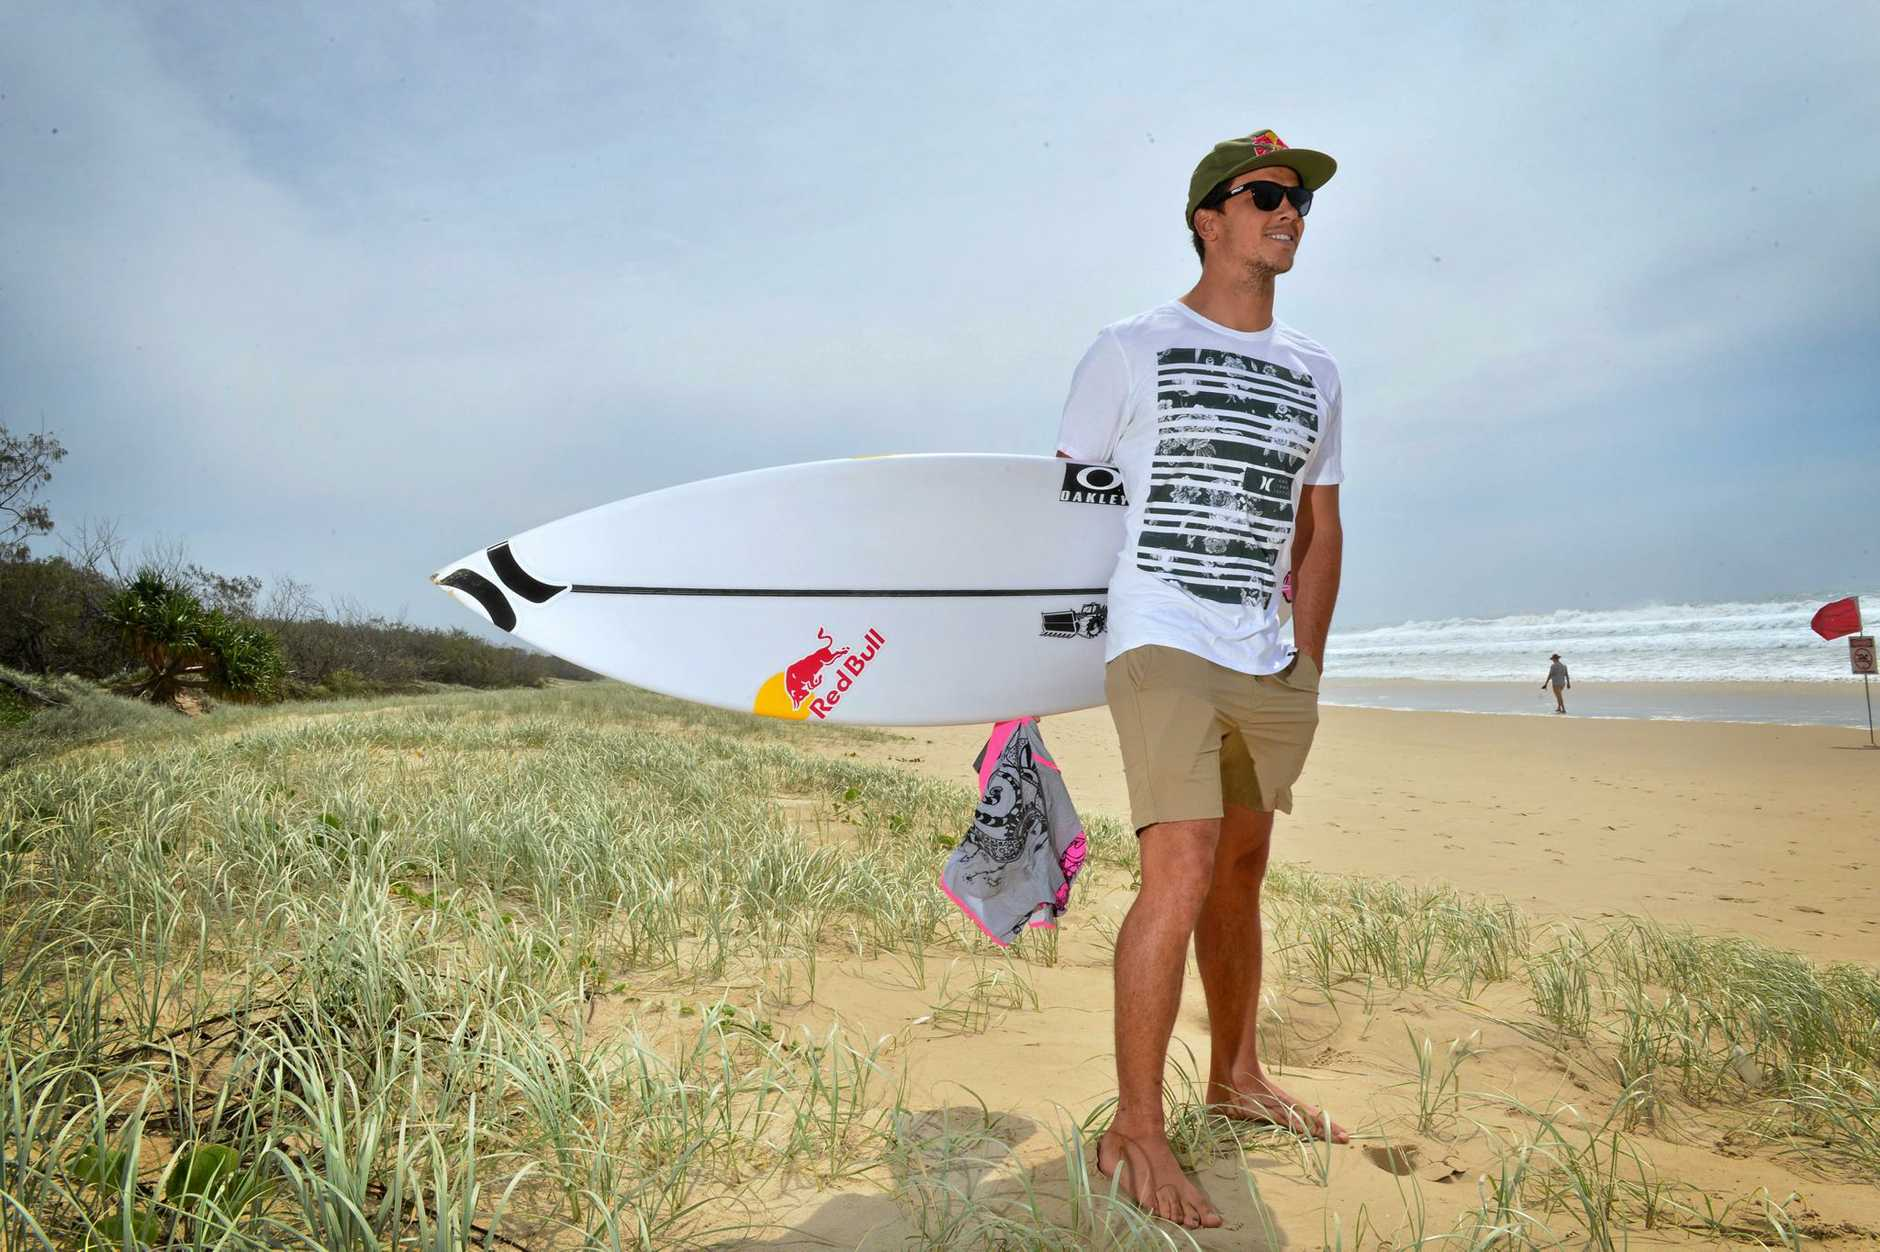 BIG YEAR: Peregian Beach surfer Julian Wilson will again wear his pink board shorts at the 2017 Quiksilver Pro.